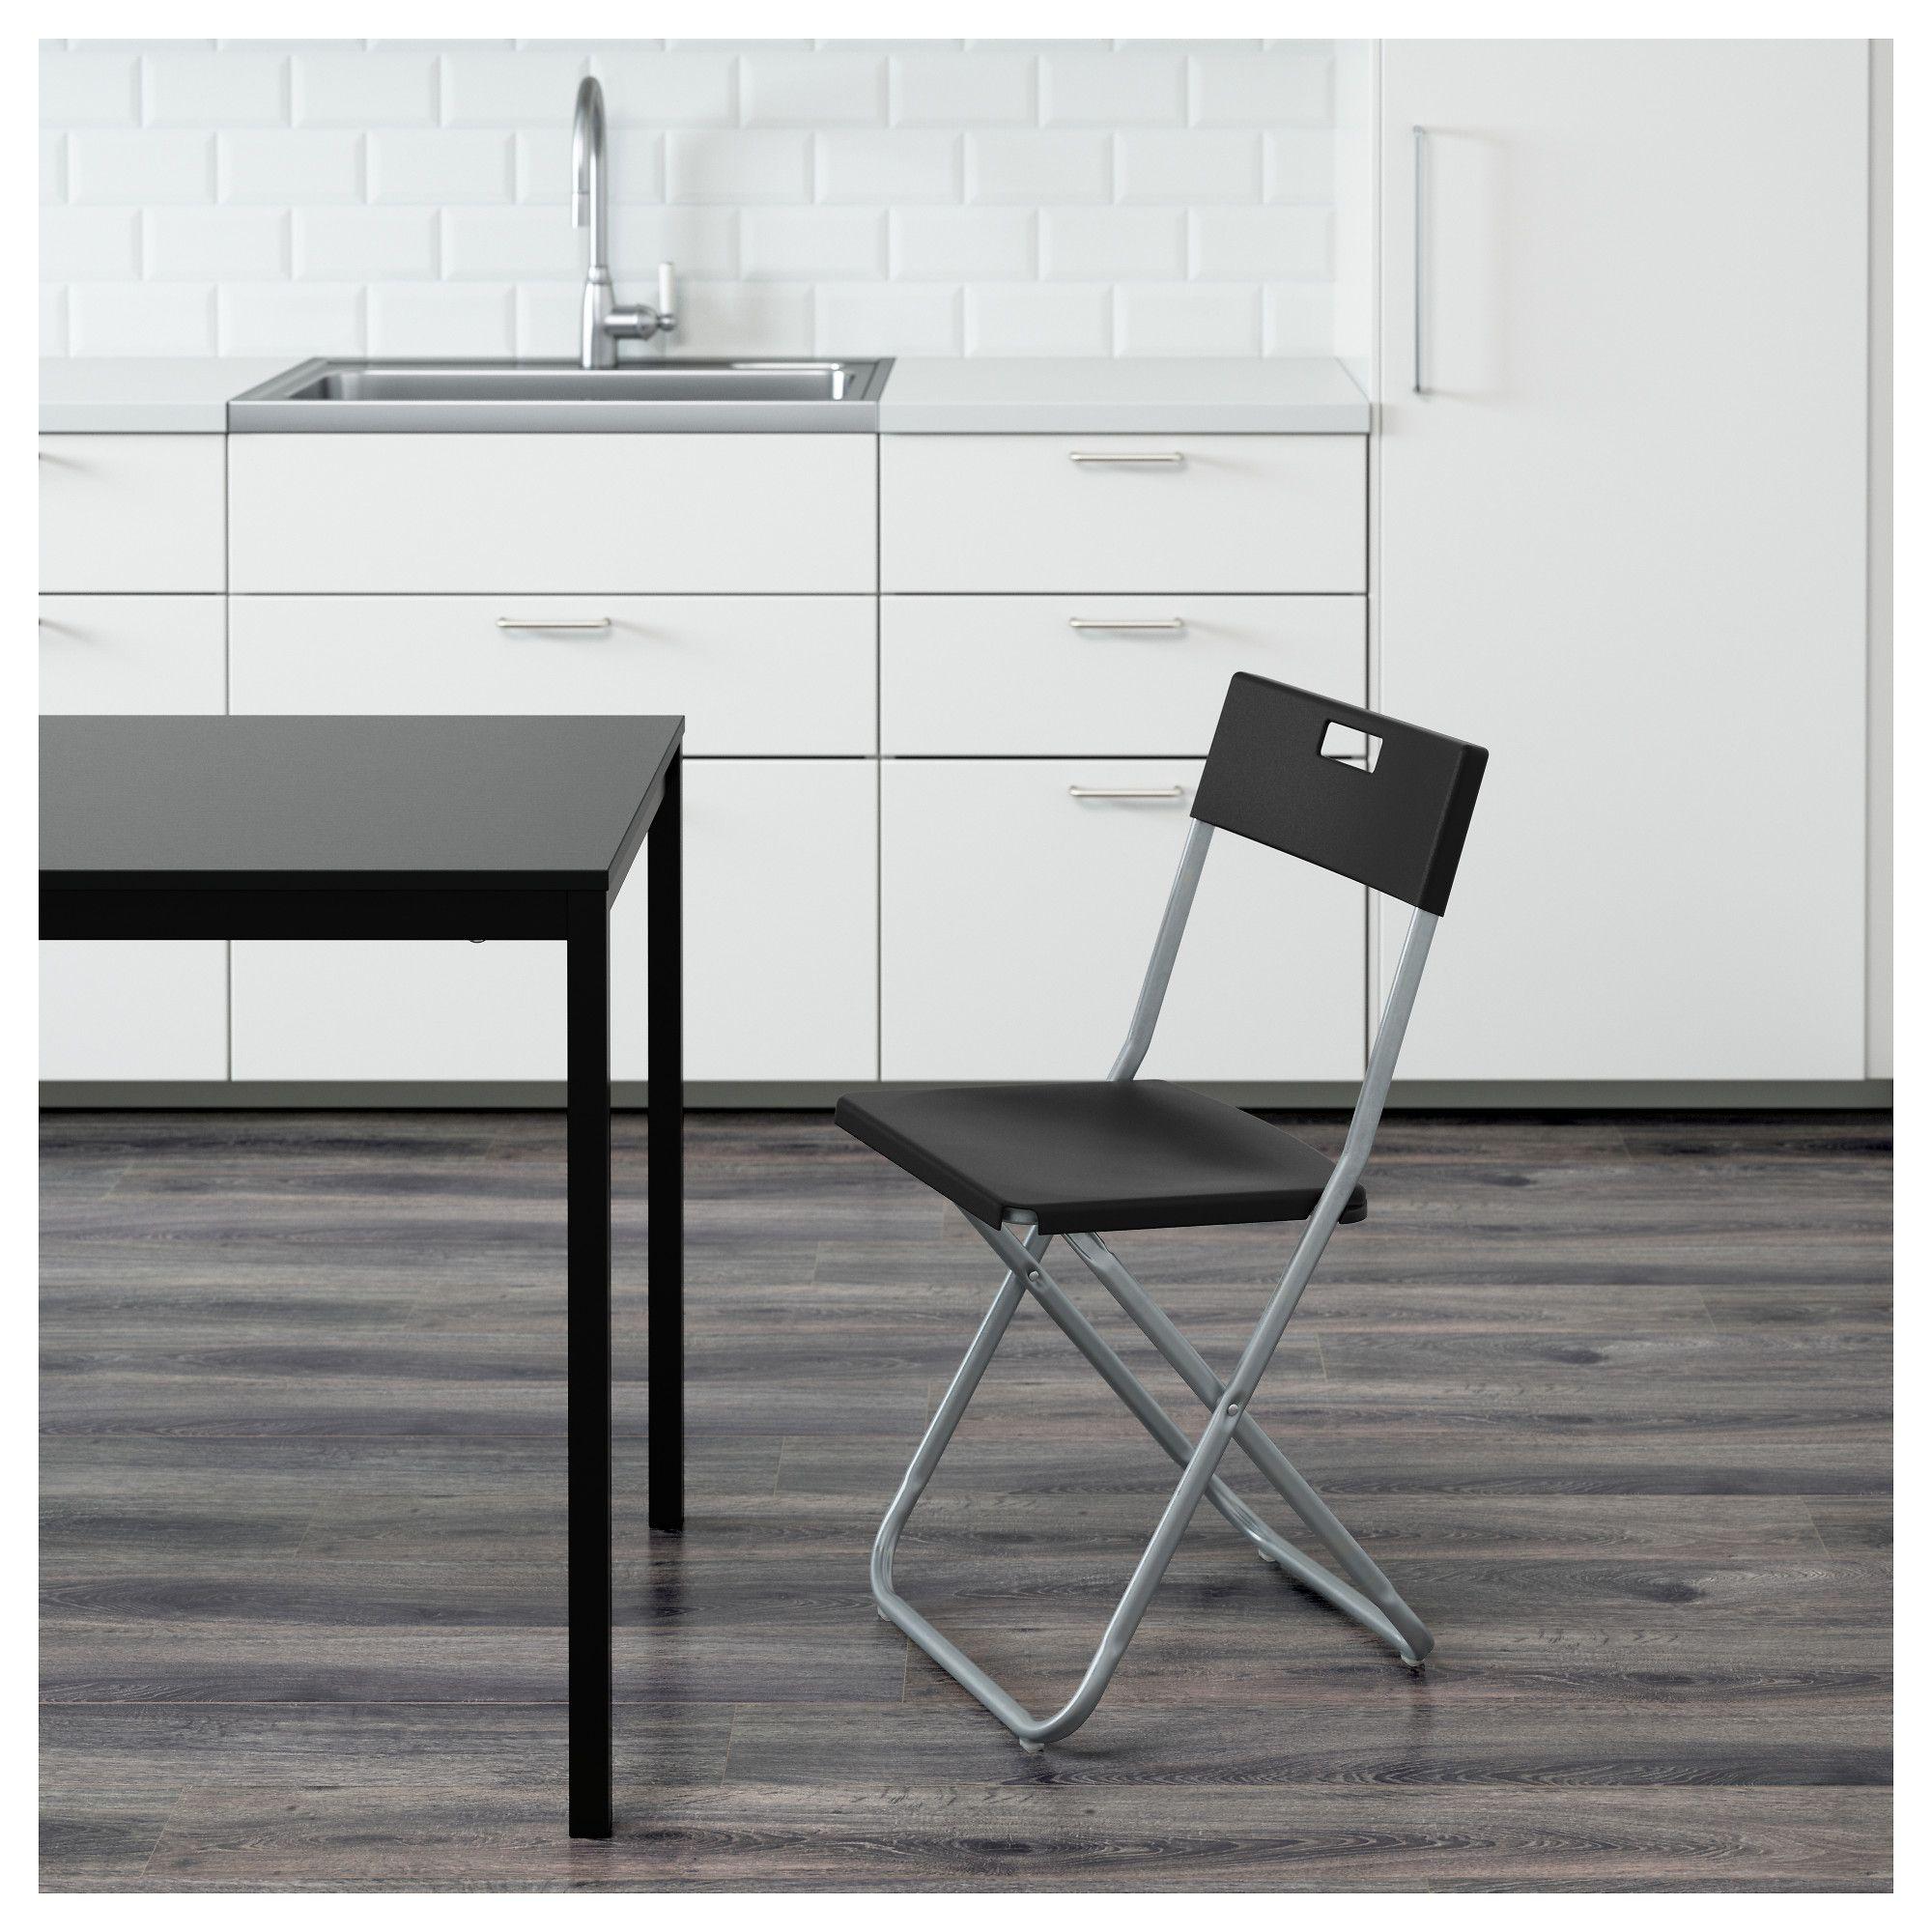 Gunde Folding Chair Black Ikea Folding Chair Ikea Folding